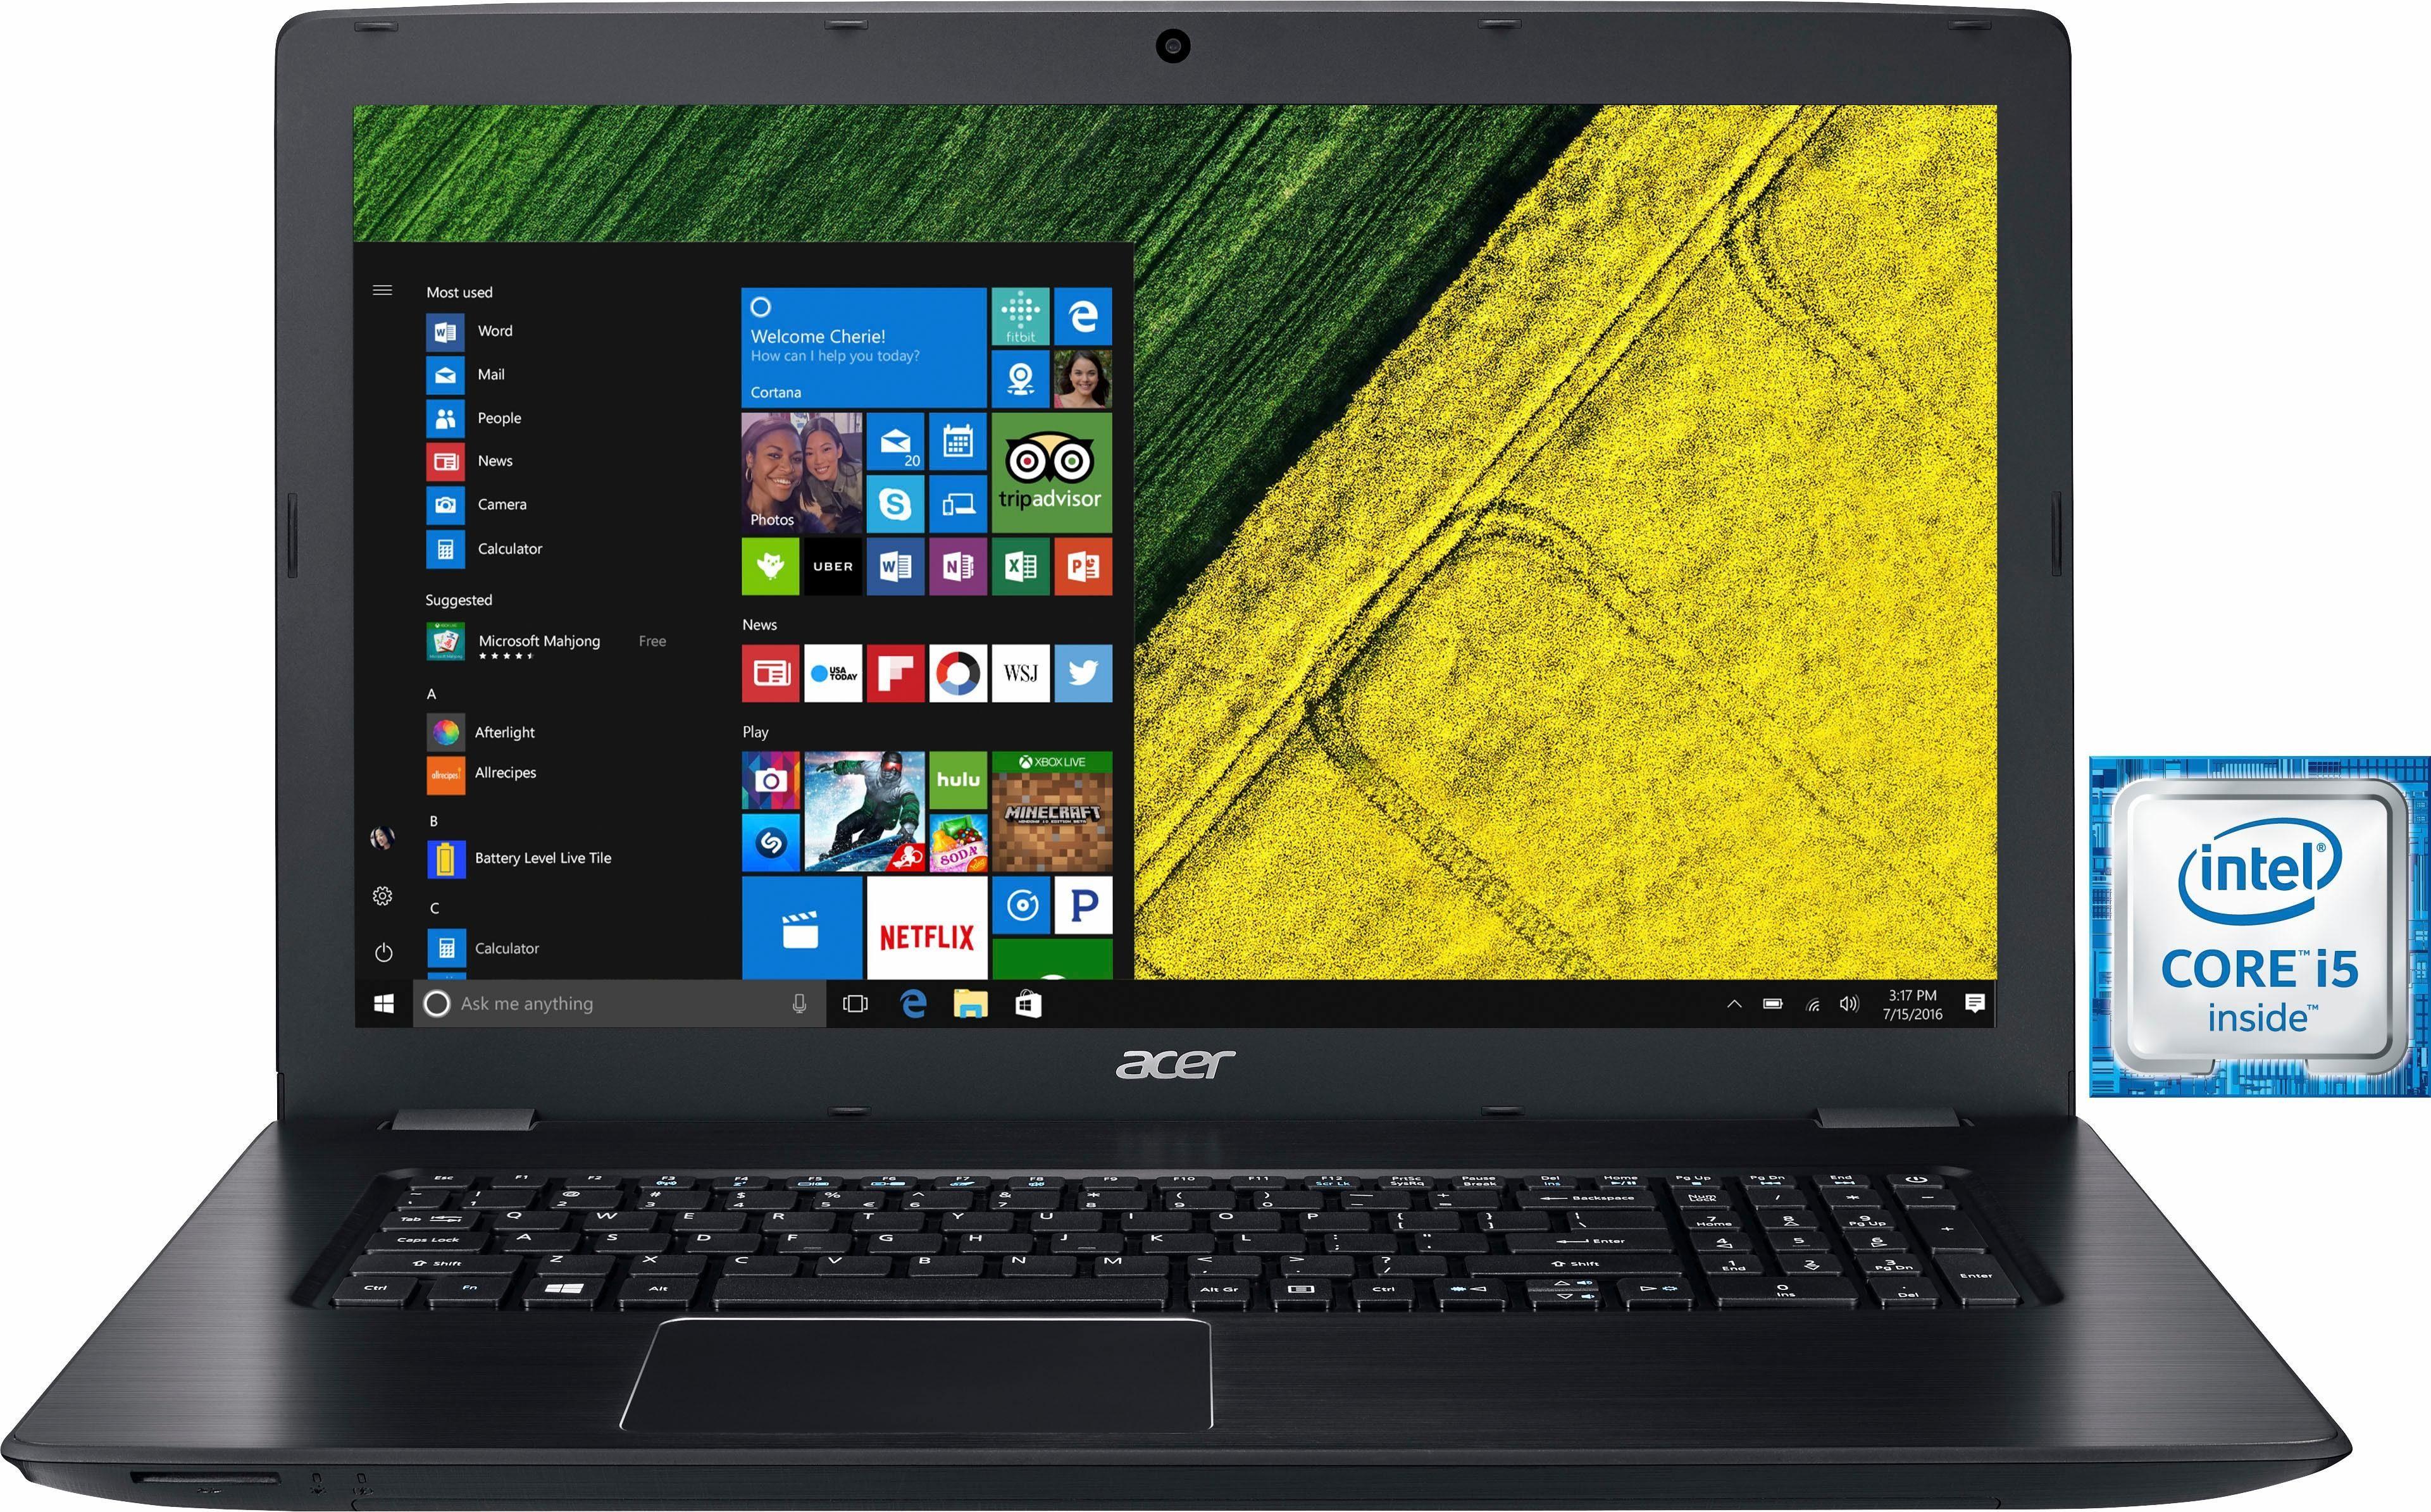 Acer Aspire E5-774G-540F Notebook, Intel® Core™ i5, 43,9 cm (17,3 Zoll), 1128 GB Speicher